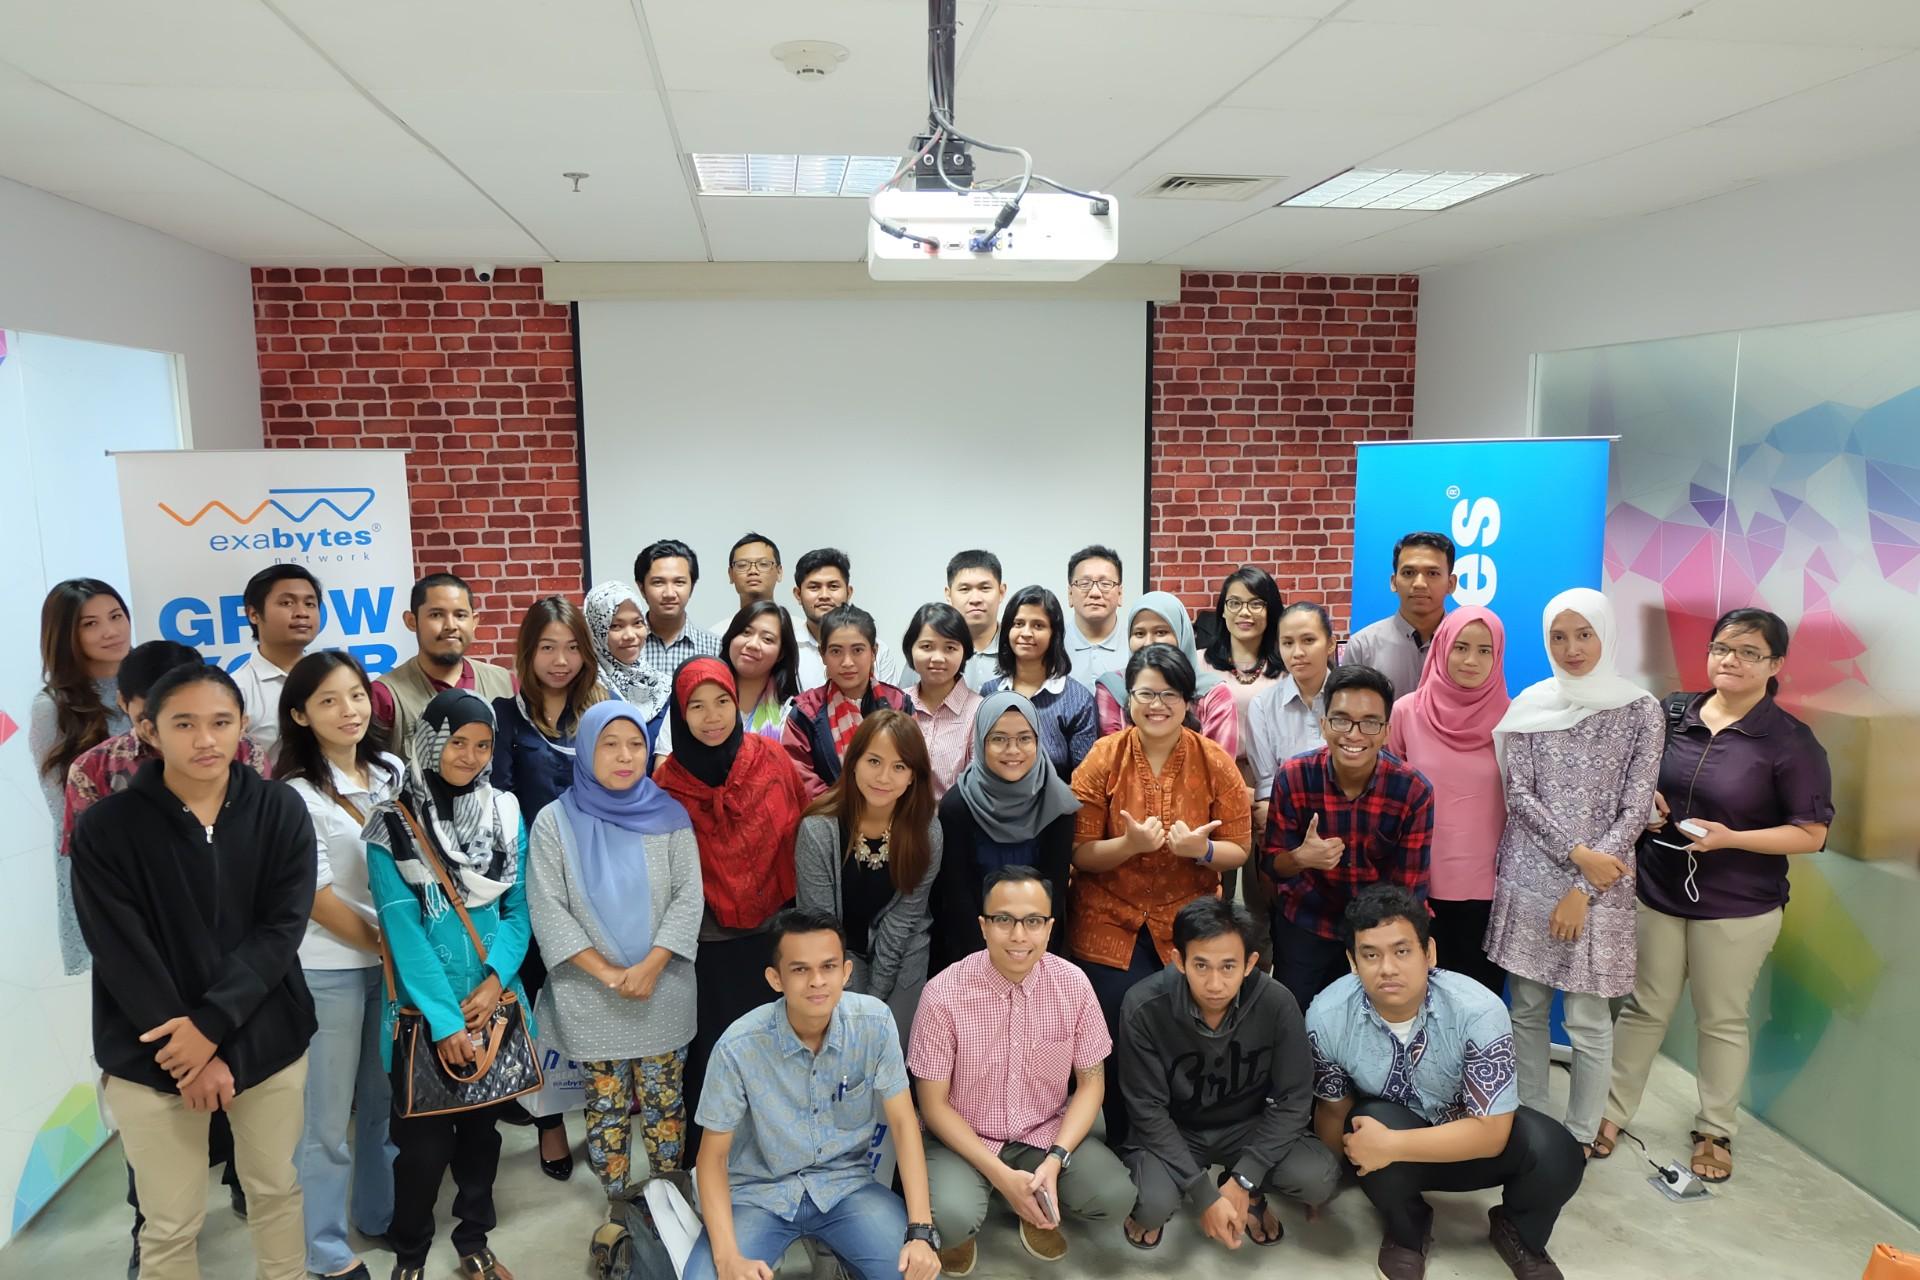 Indonesia Exabytes Digital Day event photo